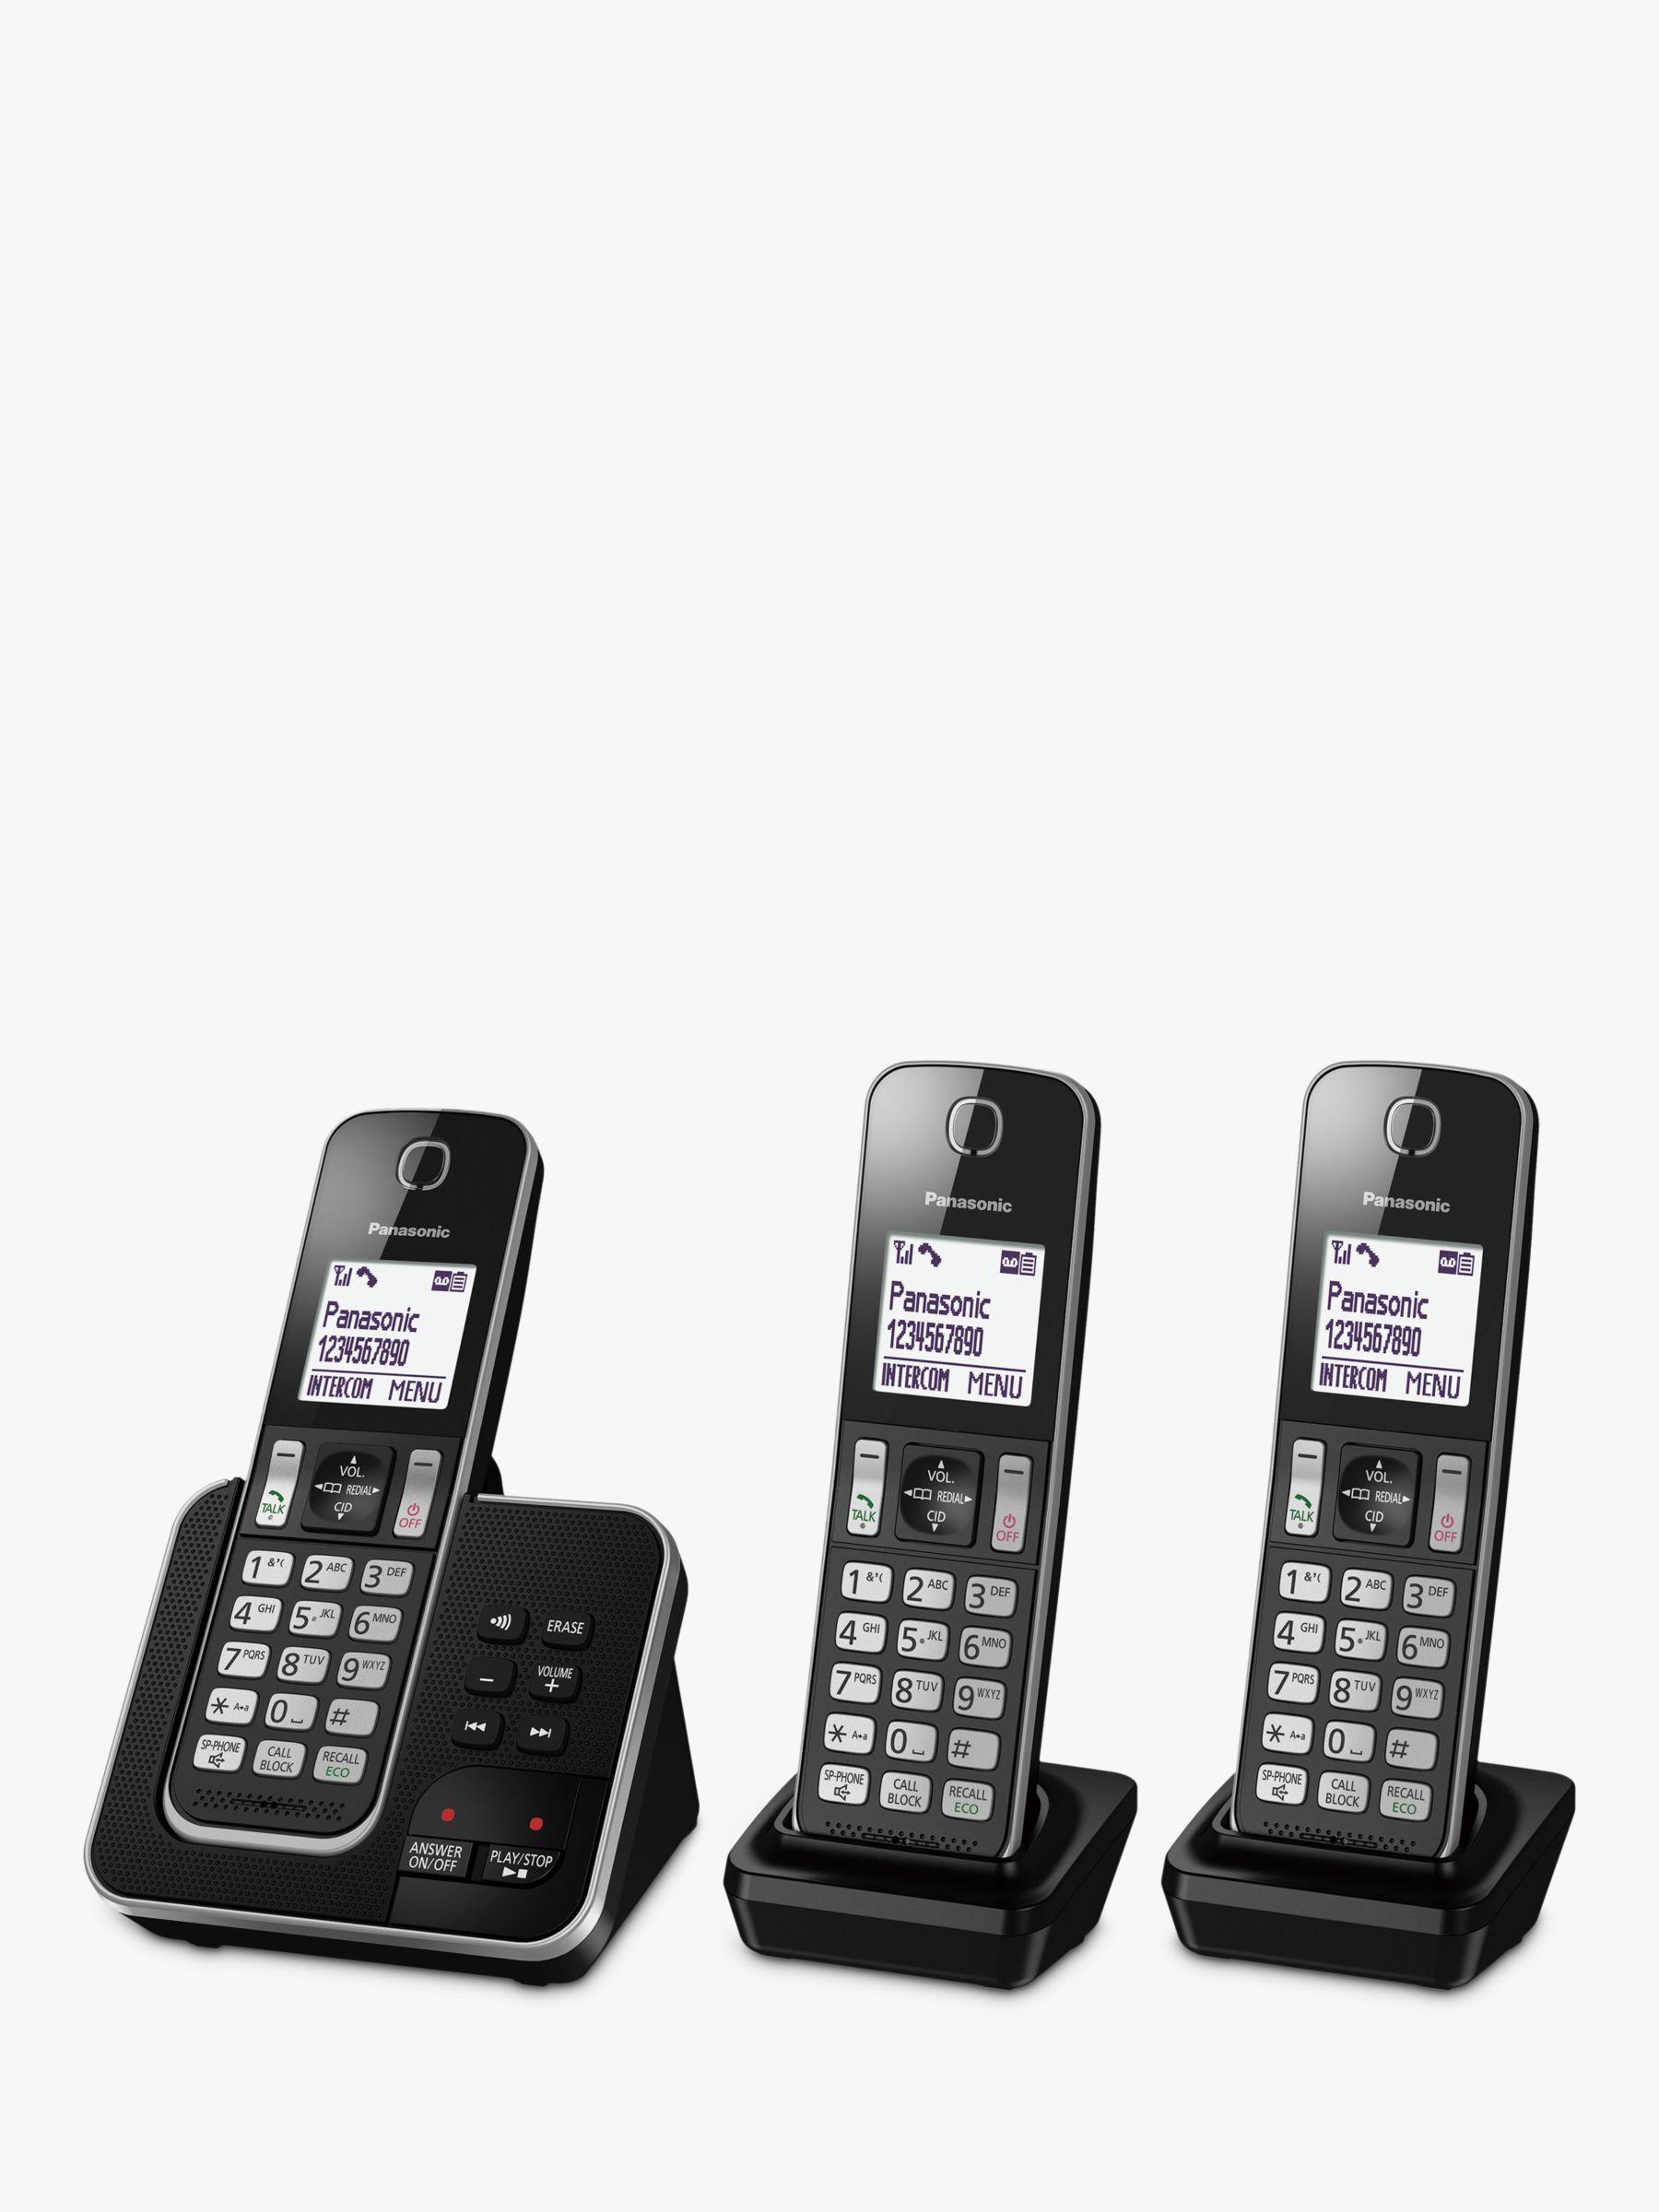 Panasonic Panasonic KX-TGD623EB Digital Cordless Telephone with Dedicated Nuisance Call Block Button and Answering Machine, Trio DECT